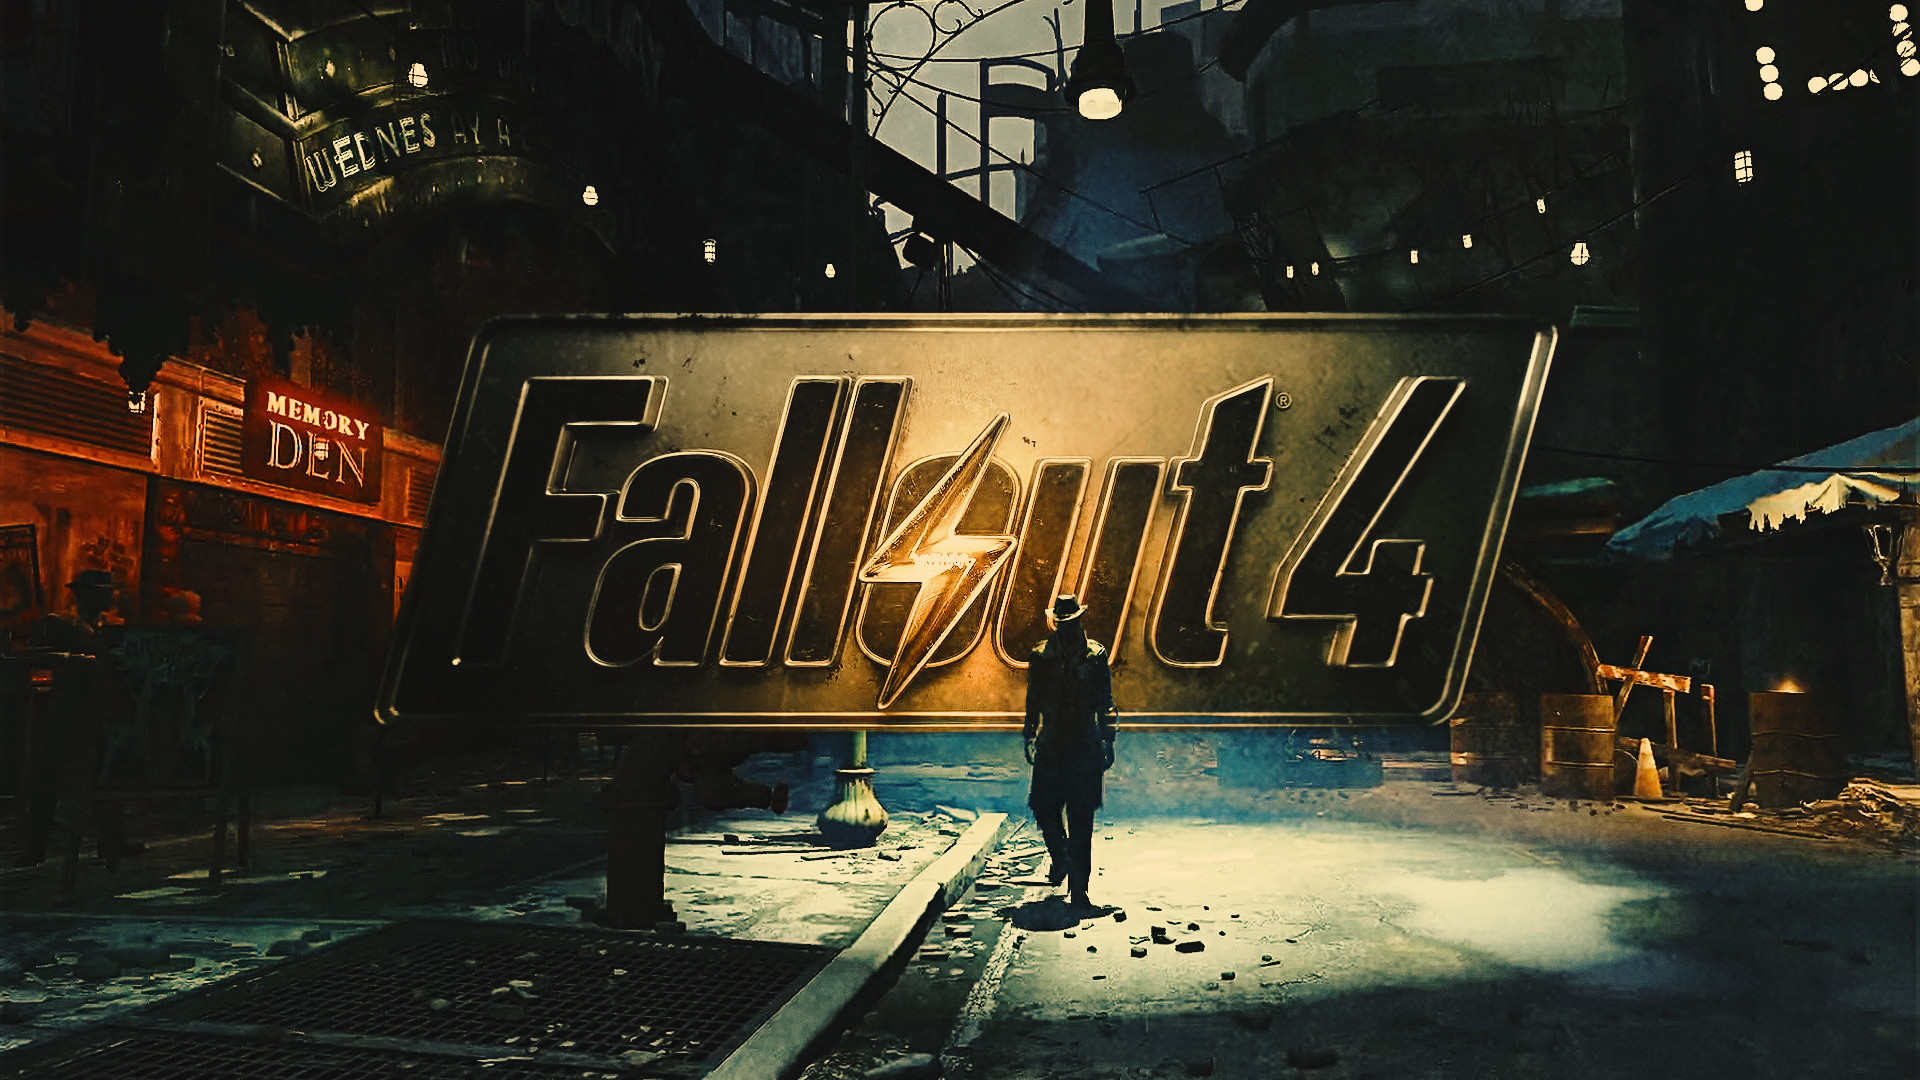 Fallout 4 wallpaper https://mbawallpaperscom.ipage.com/gaming .